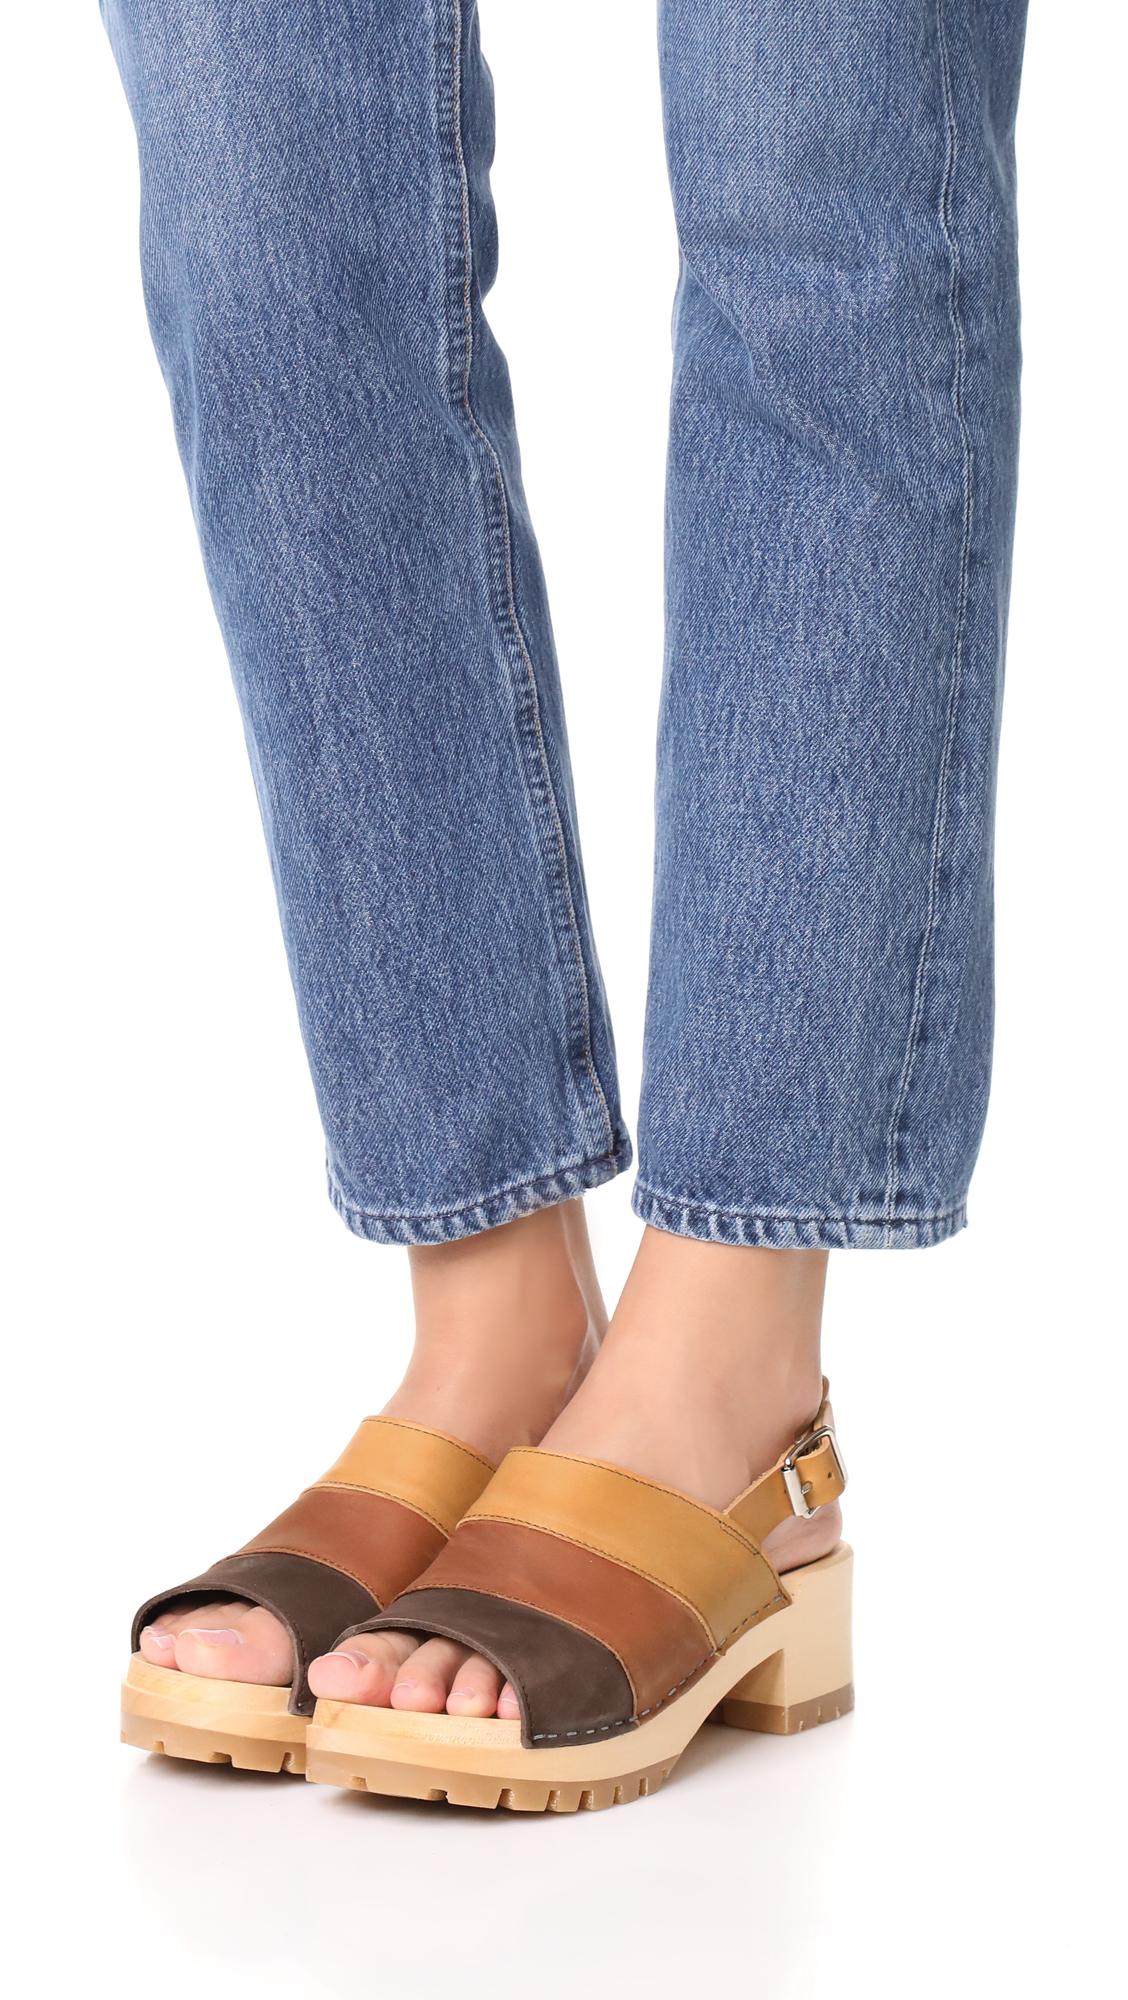 6a7e843e26c Swedish Hasbeens Hippie Sandals